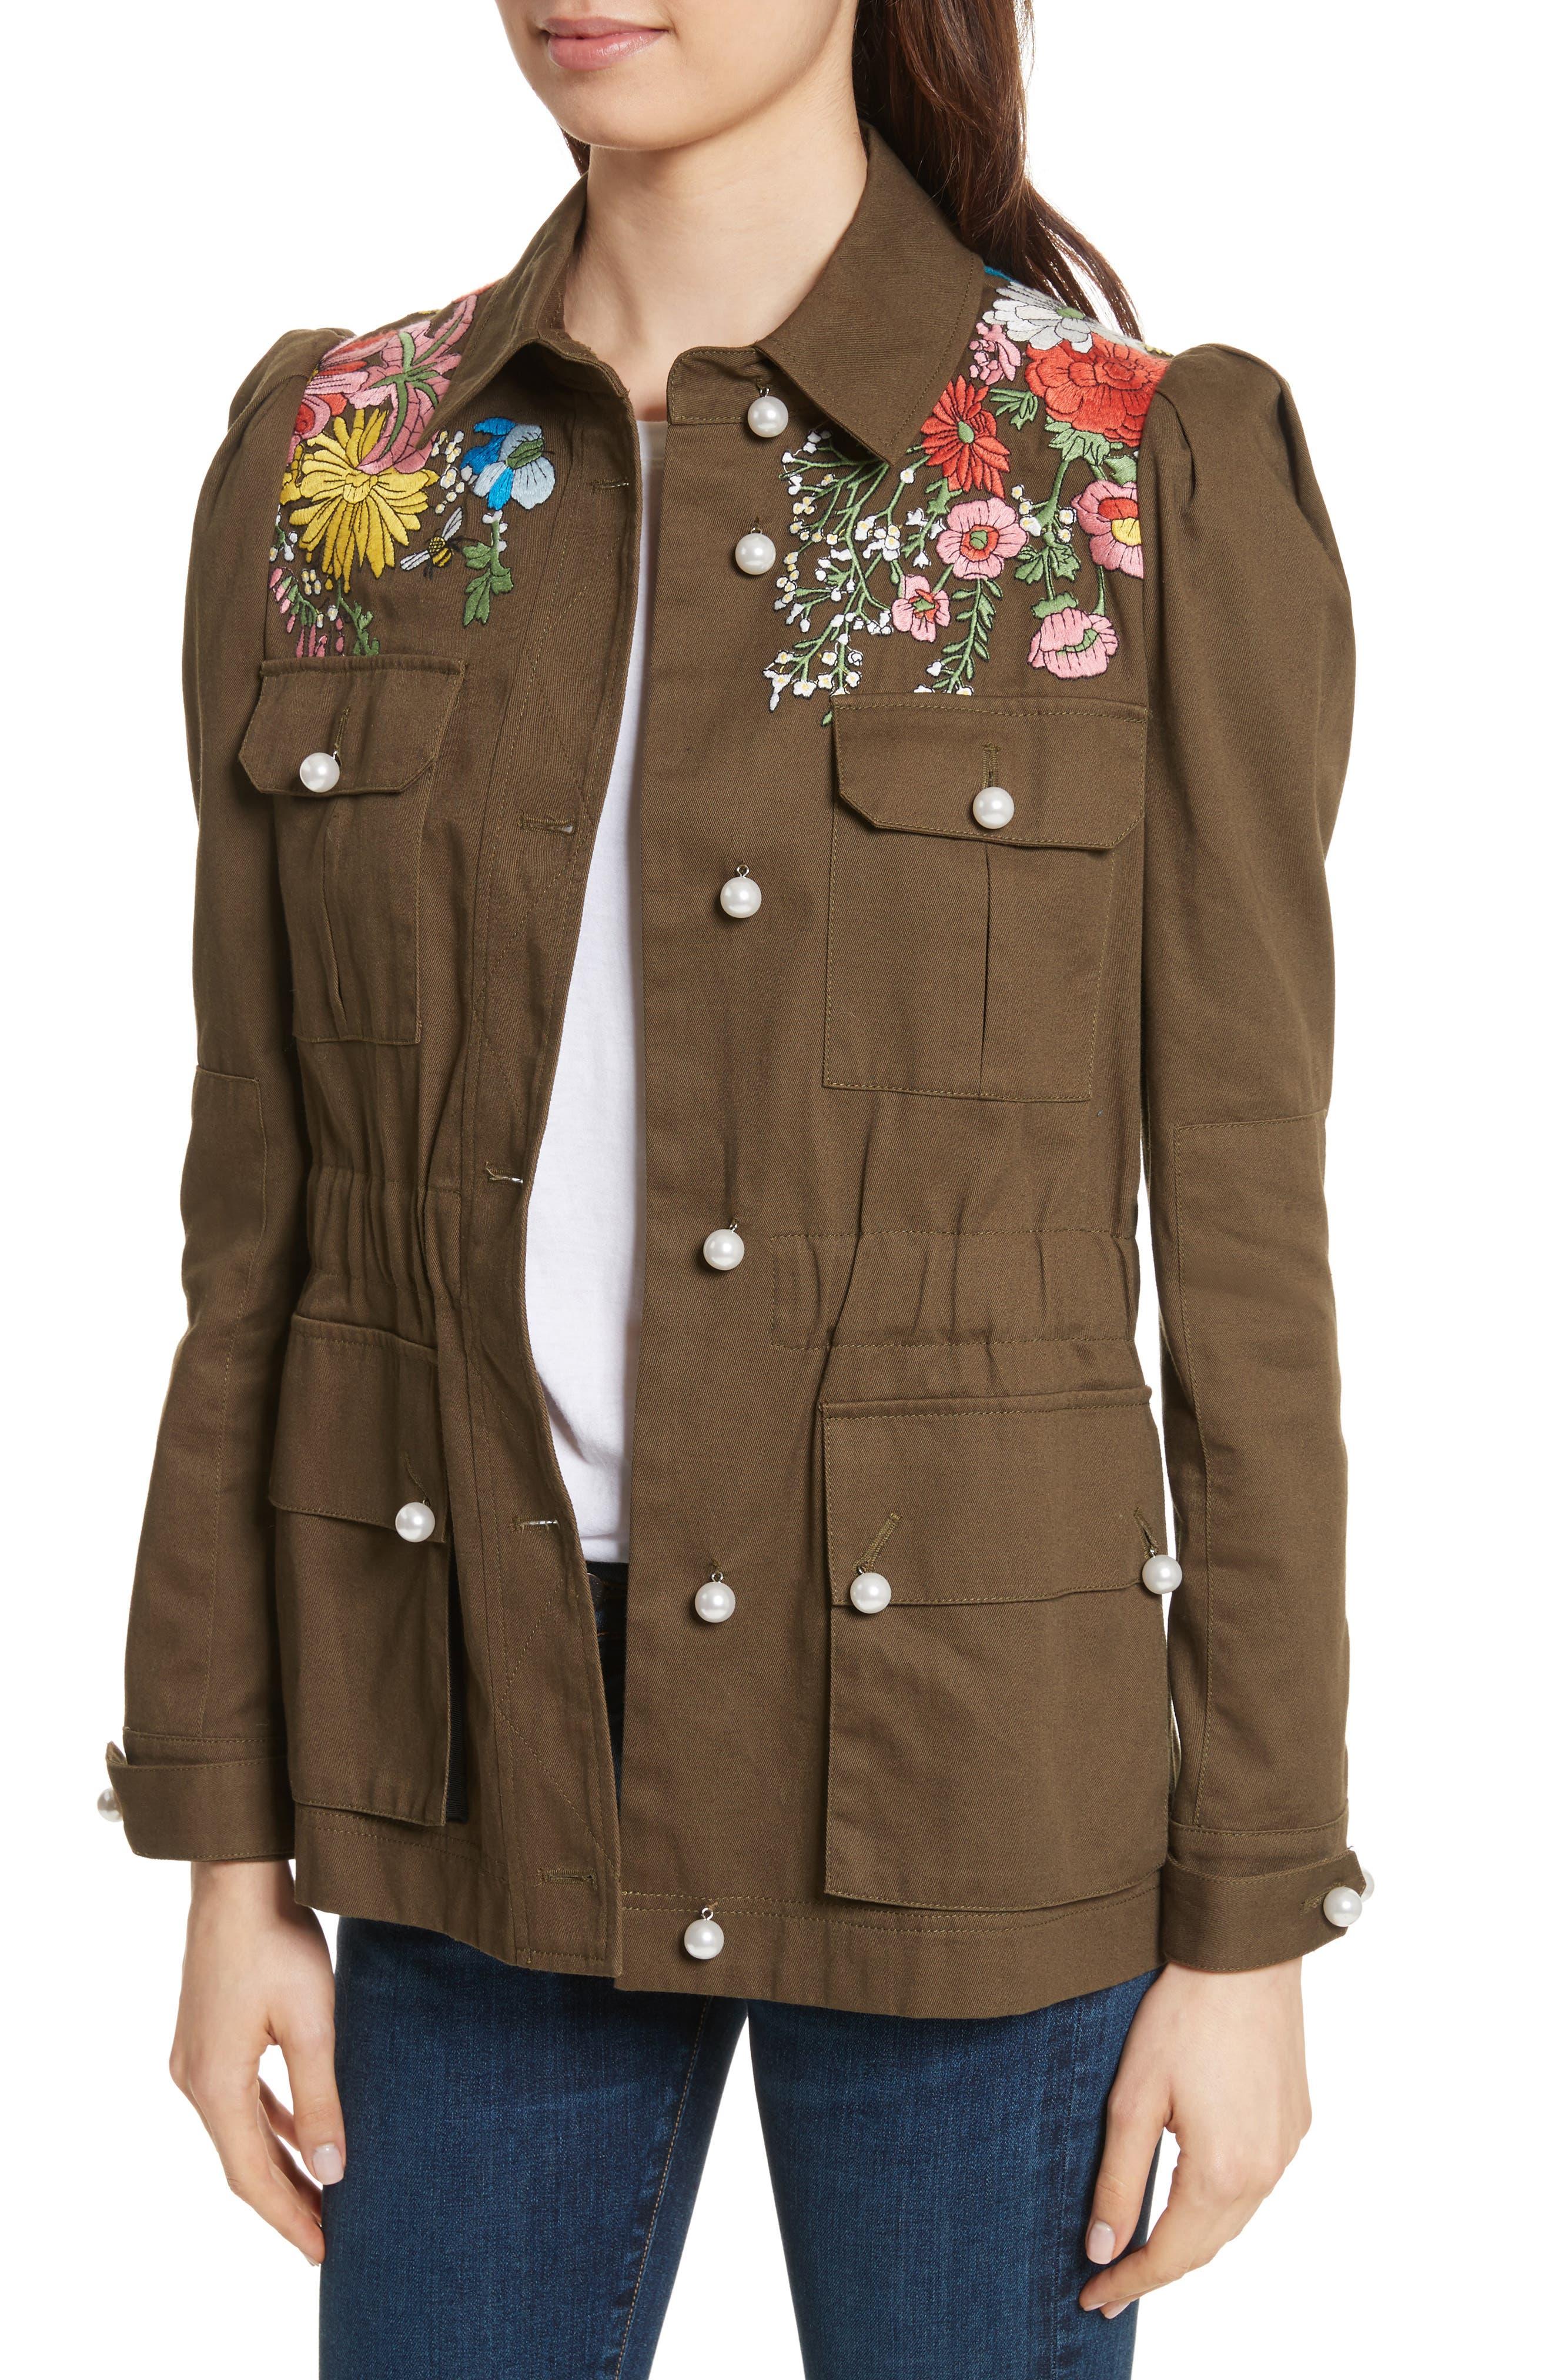 Huxley Floral Embroidered Safari Jacket,                             Alternate thumbnail 4, color,                             310